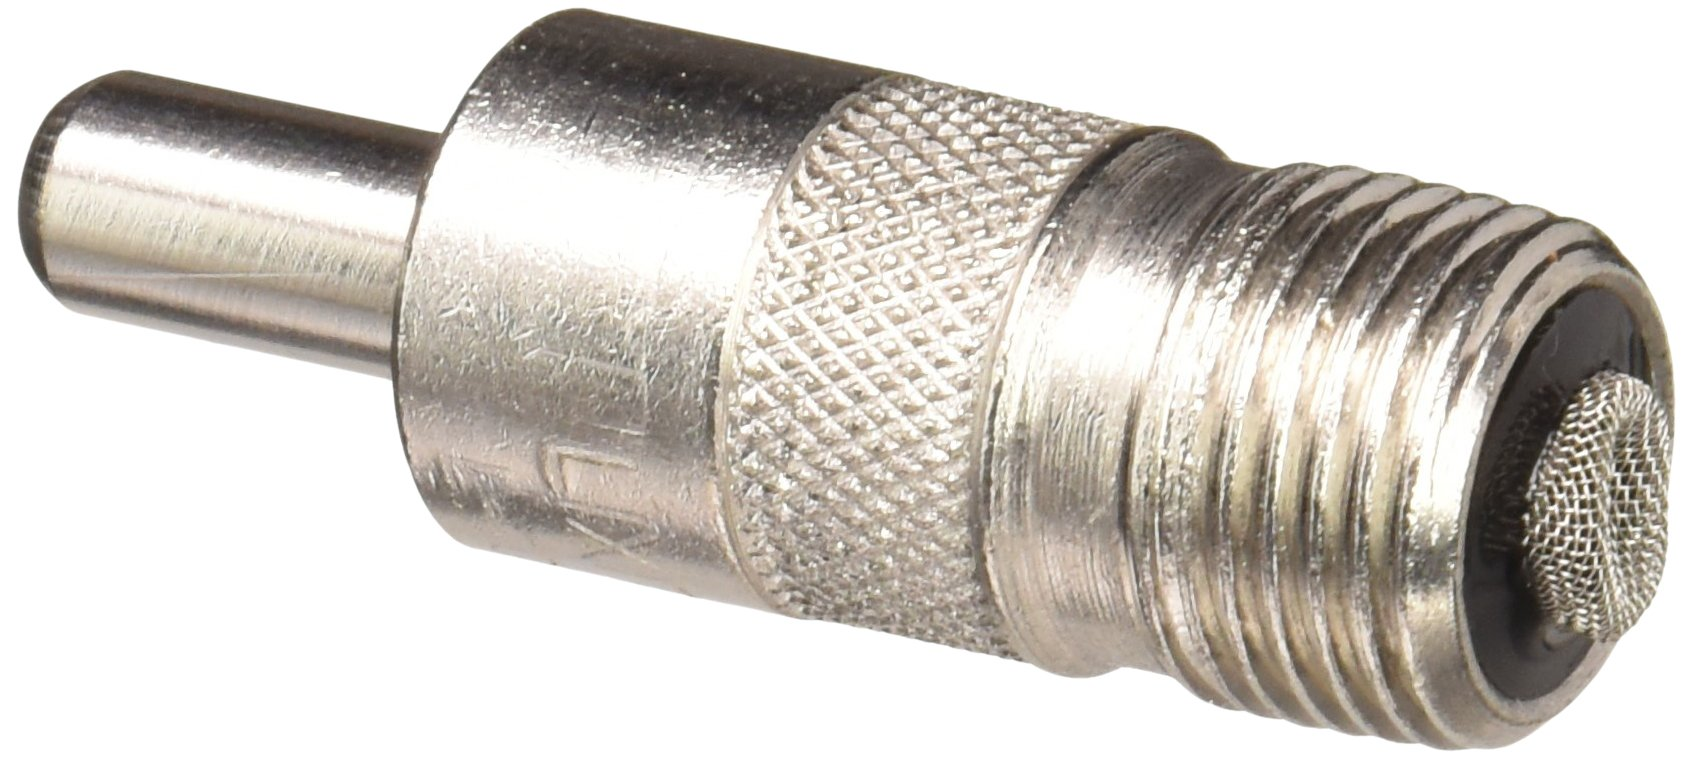 Lixit 30-0915-020 L-70 20pk Water Nipple by Lixit (Image #1)